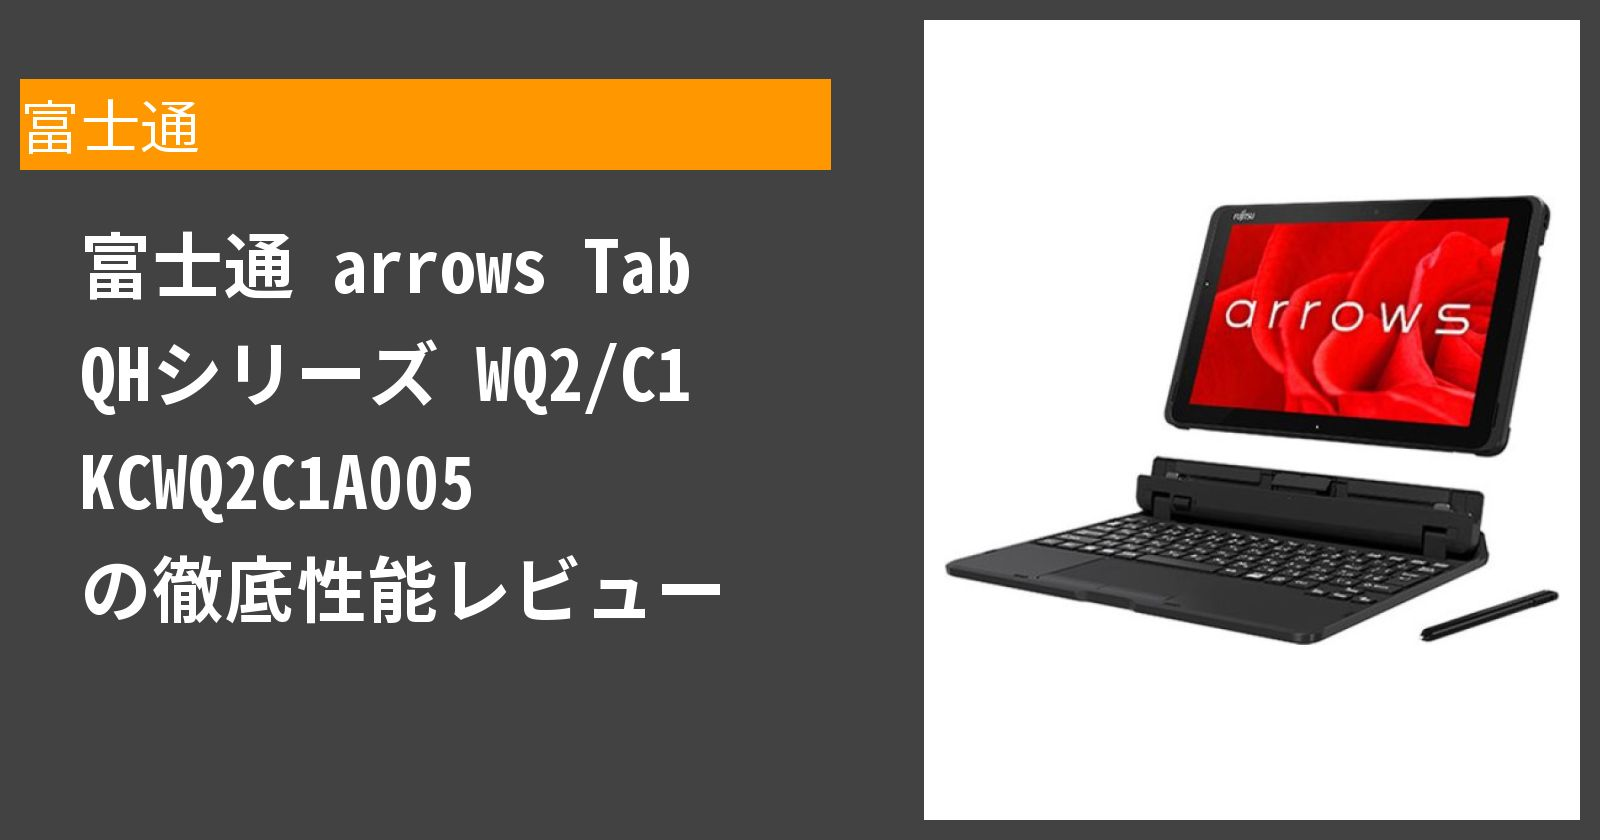 arrows Tab QHシリーズ WQ2/C1 KCWQ2C1A005 の徹底性能レビュー